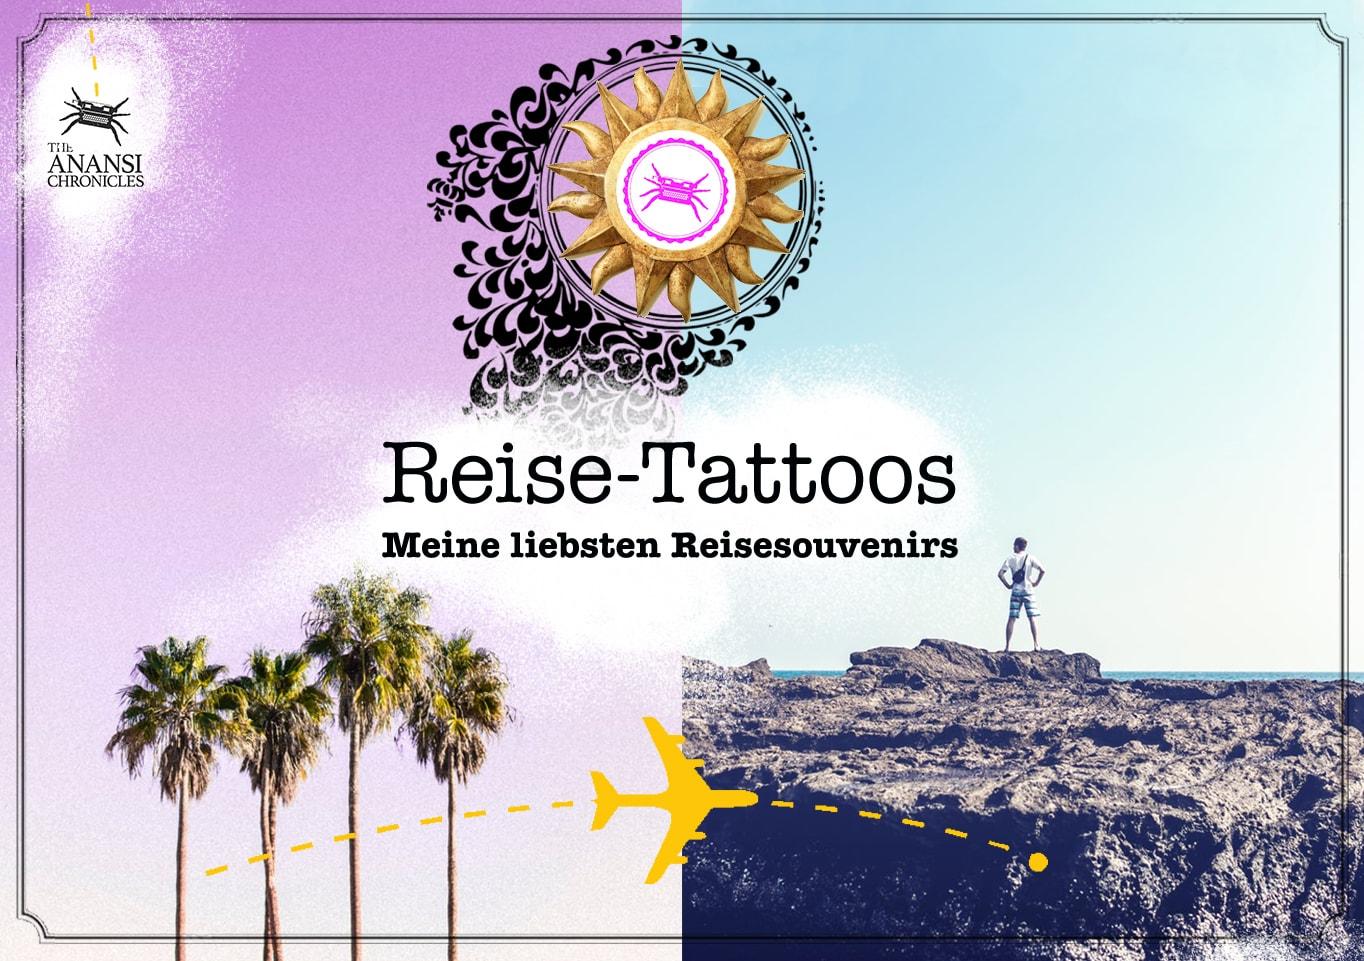 Tattoos – Gute Reisesouvenirs?